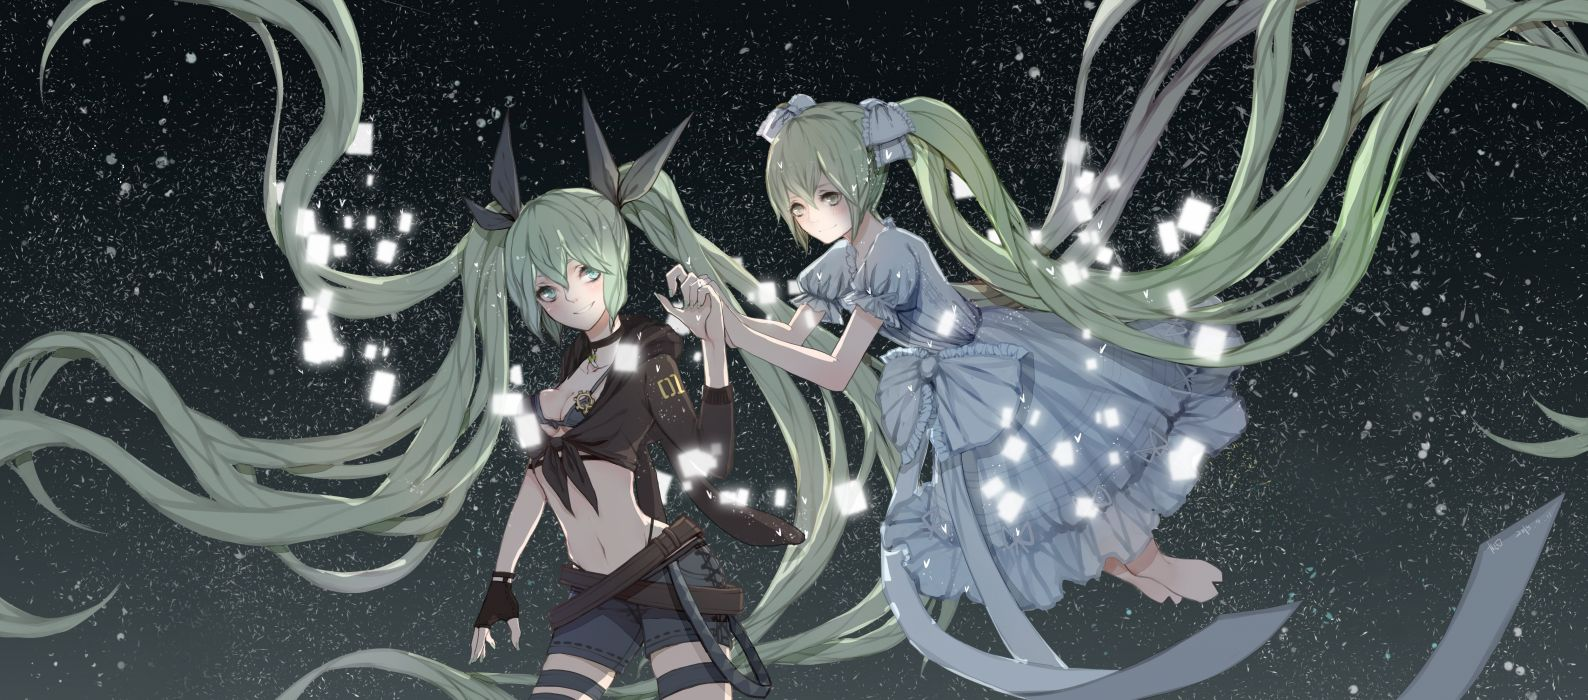 dualscreen gloves green eyes green hair hatsune miku long hair ribbons sky stars twintails vocaloid wallpaper